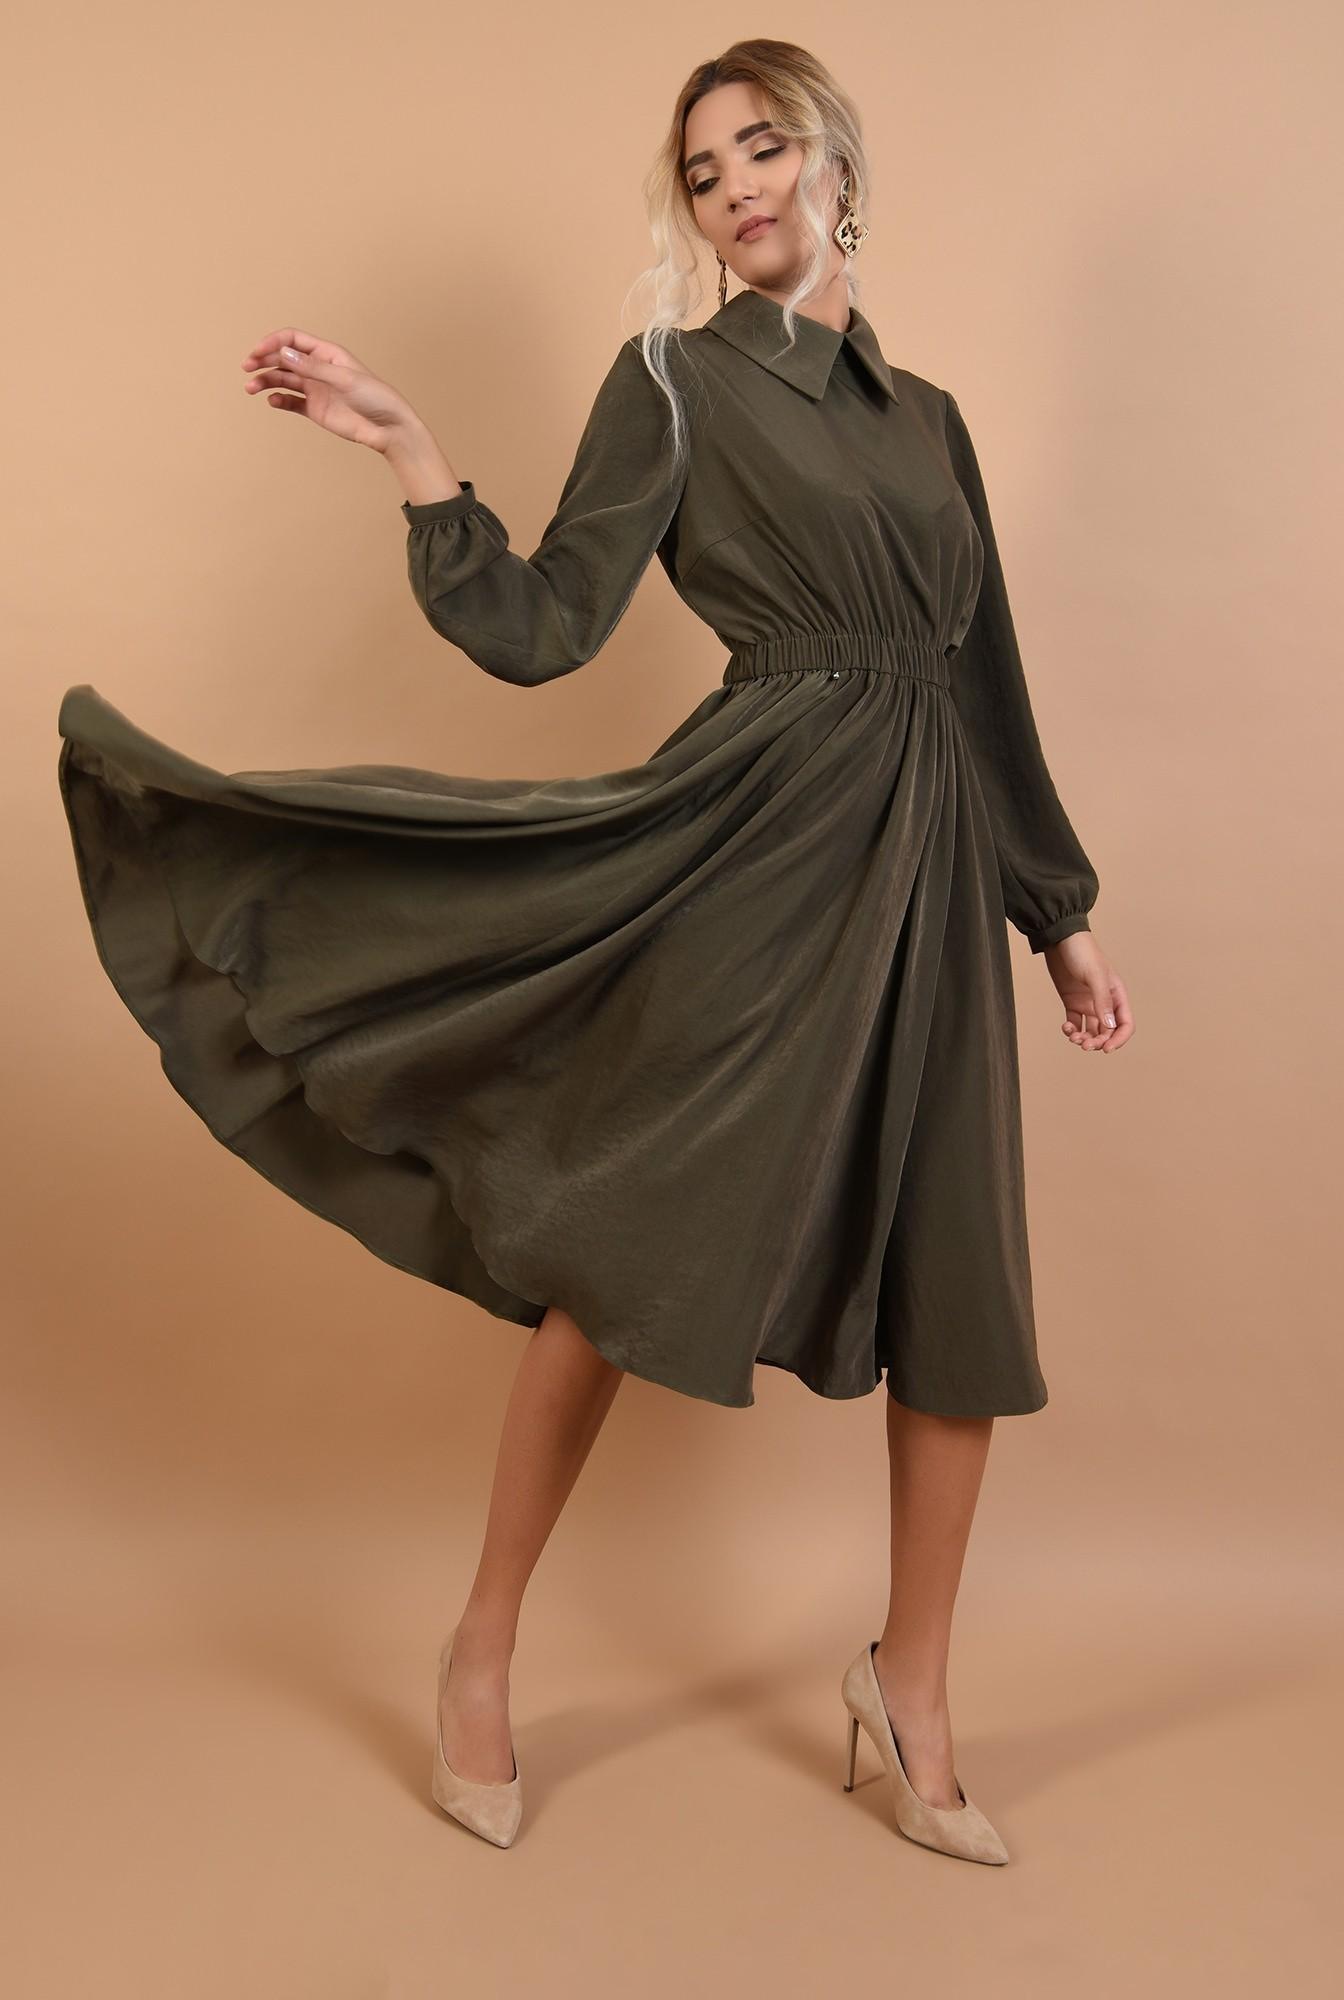 0 - 360 - rochie casual, midi, evazata, talie variabila, guler ascutit